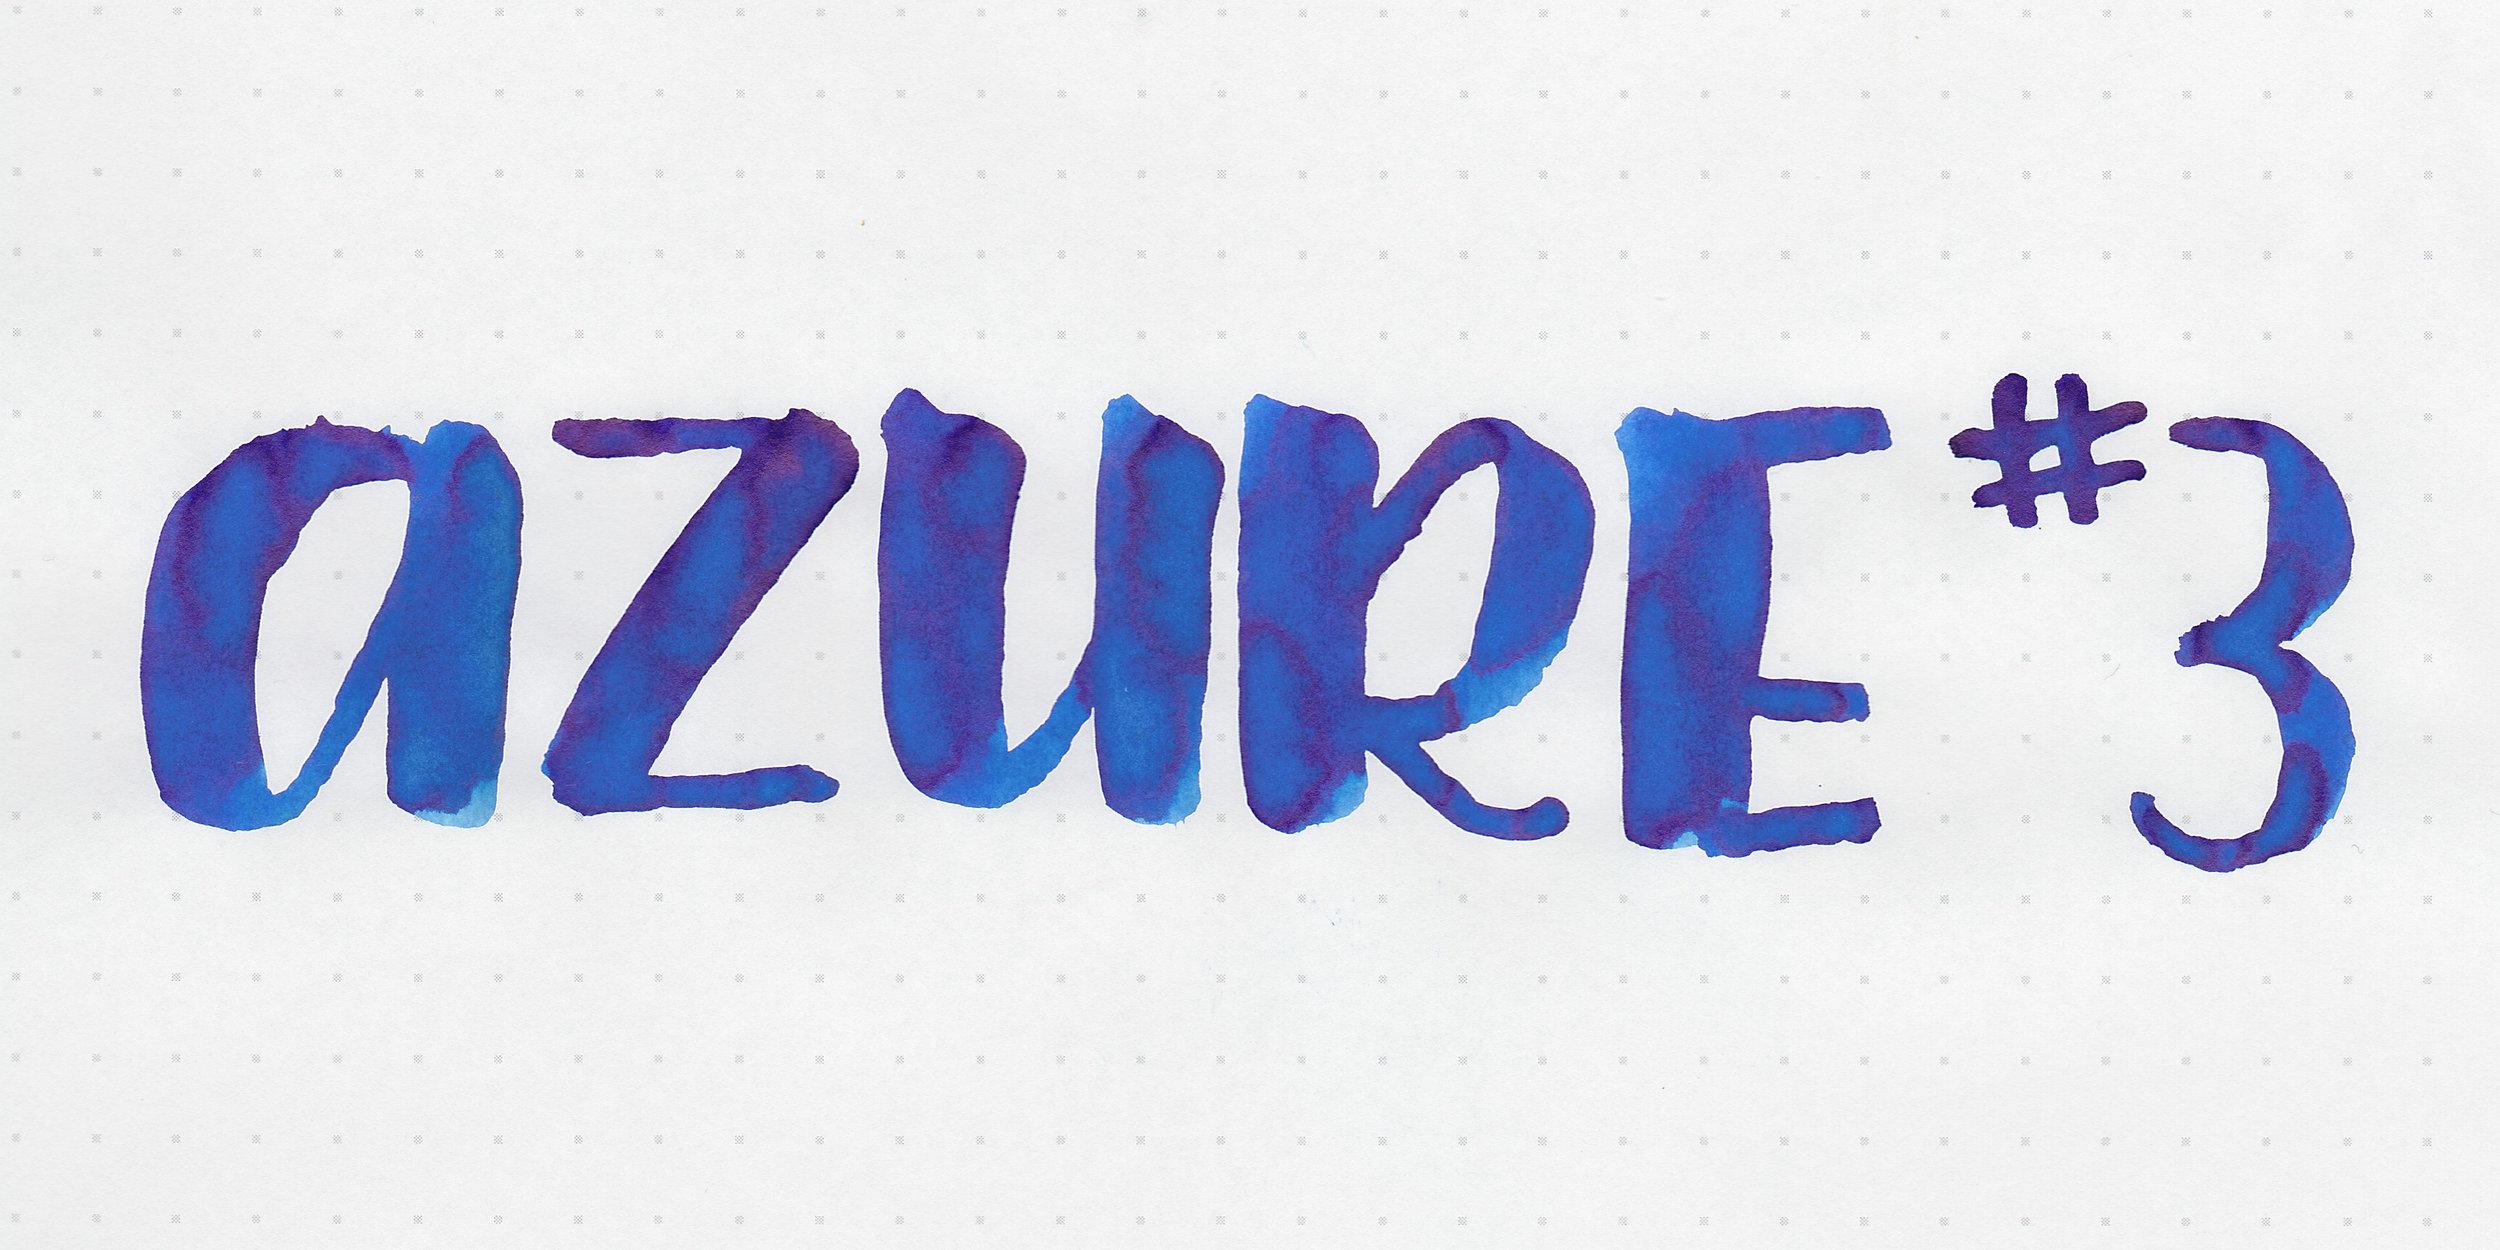 kwz-azure-3-2.jpg